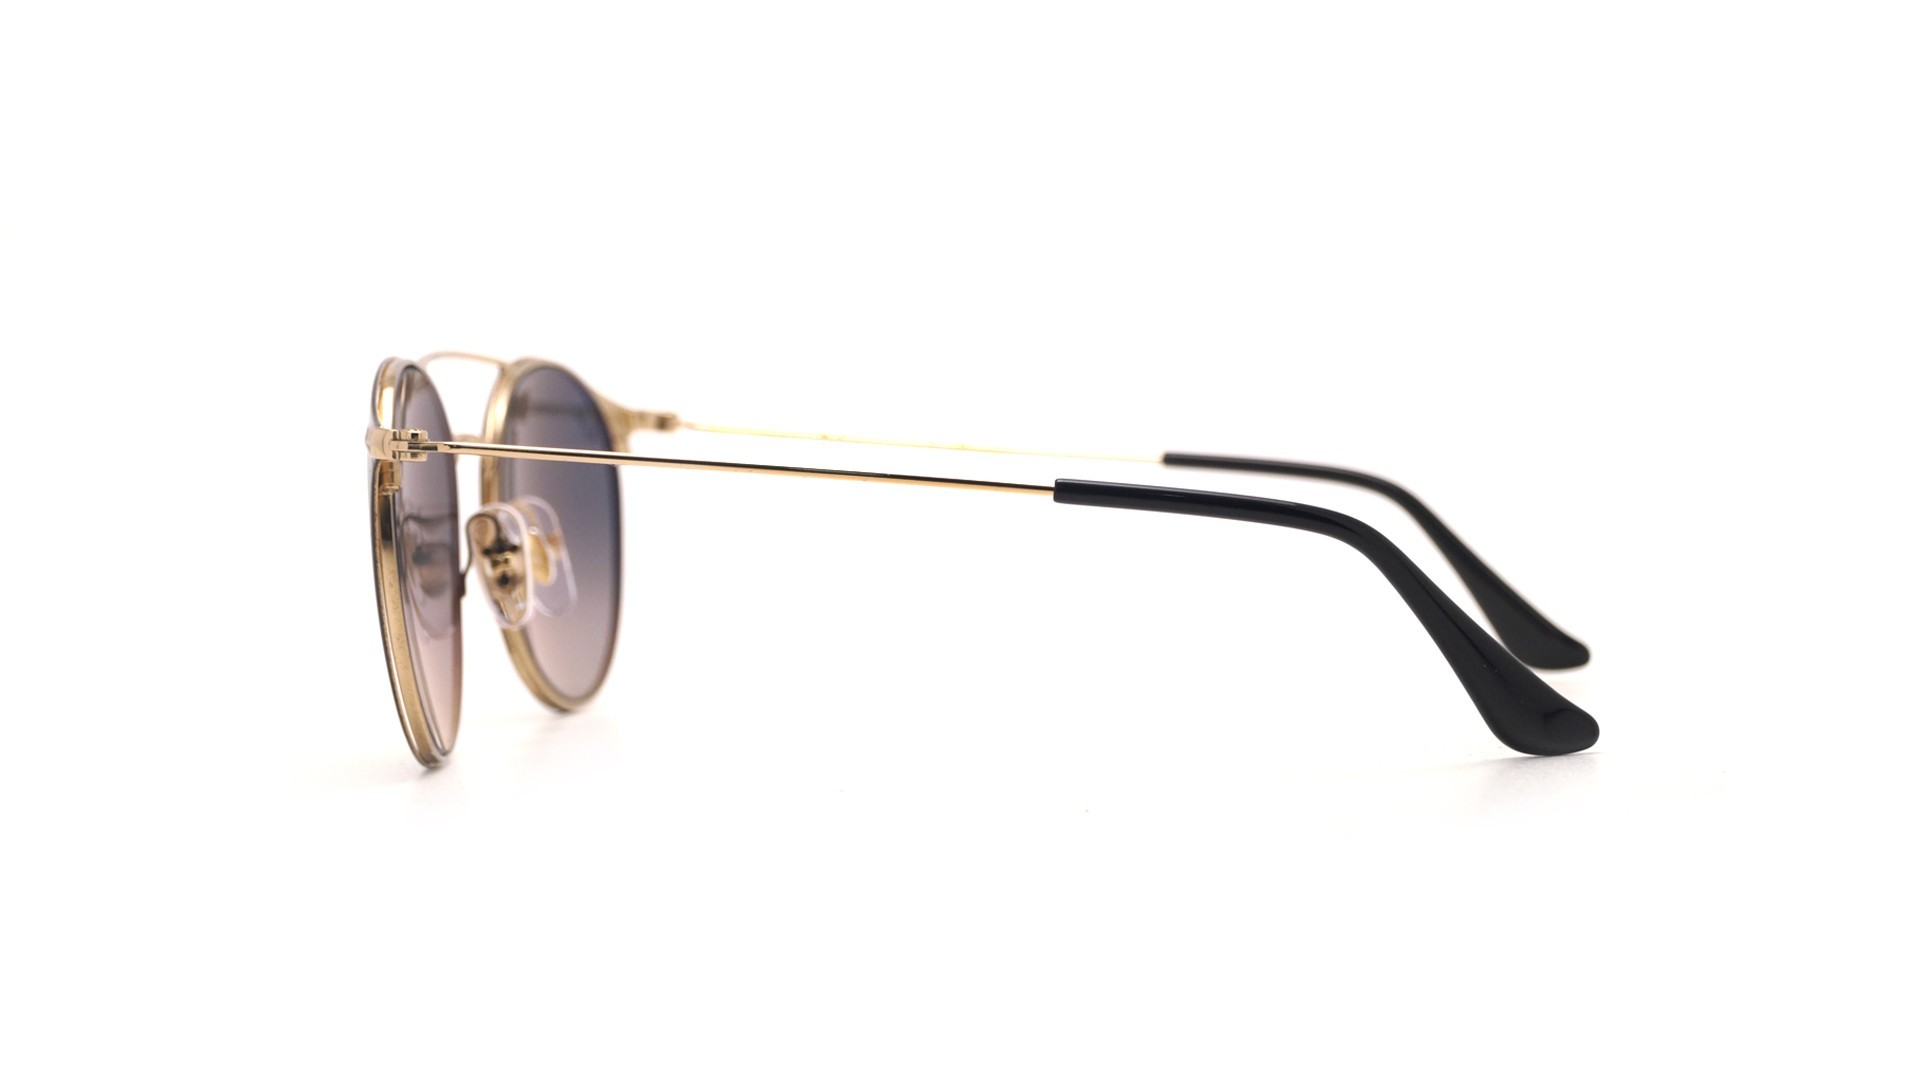 9ea4ed95cad3fc Sunglasses Ray-Ban RB3546 187 71 52-20 Black Medium Gradient